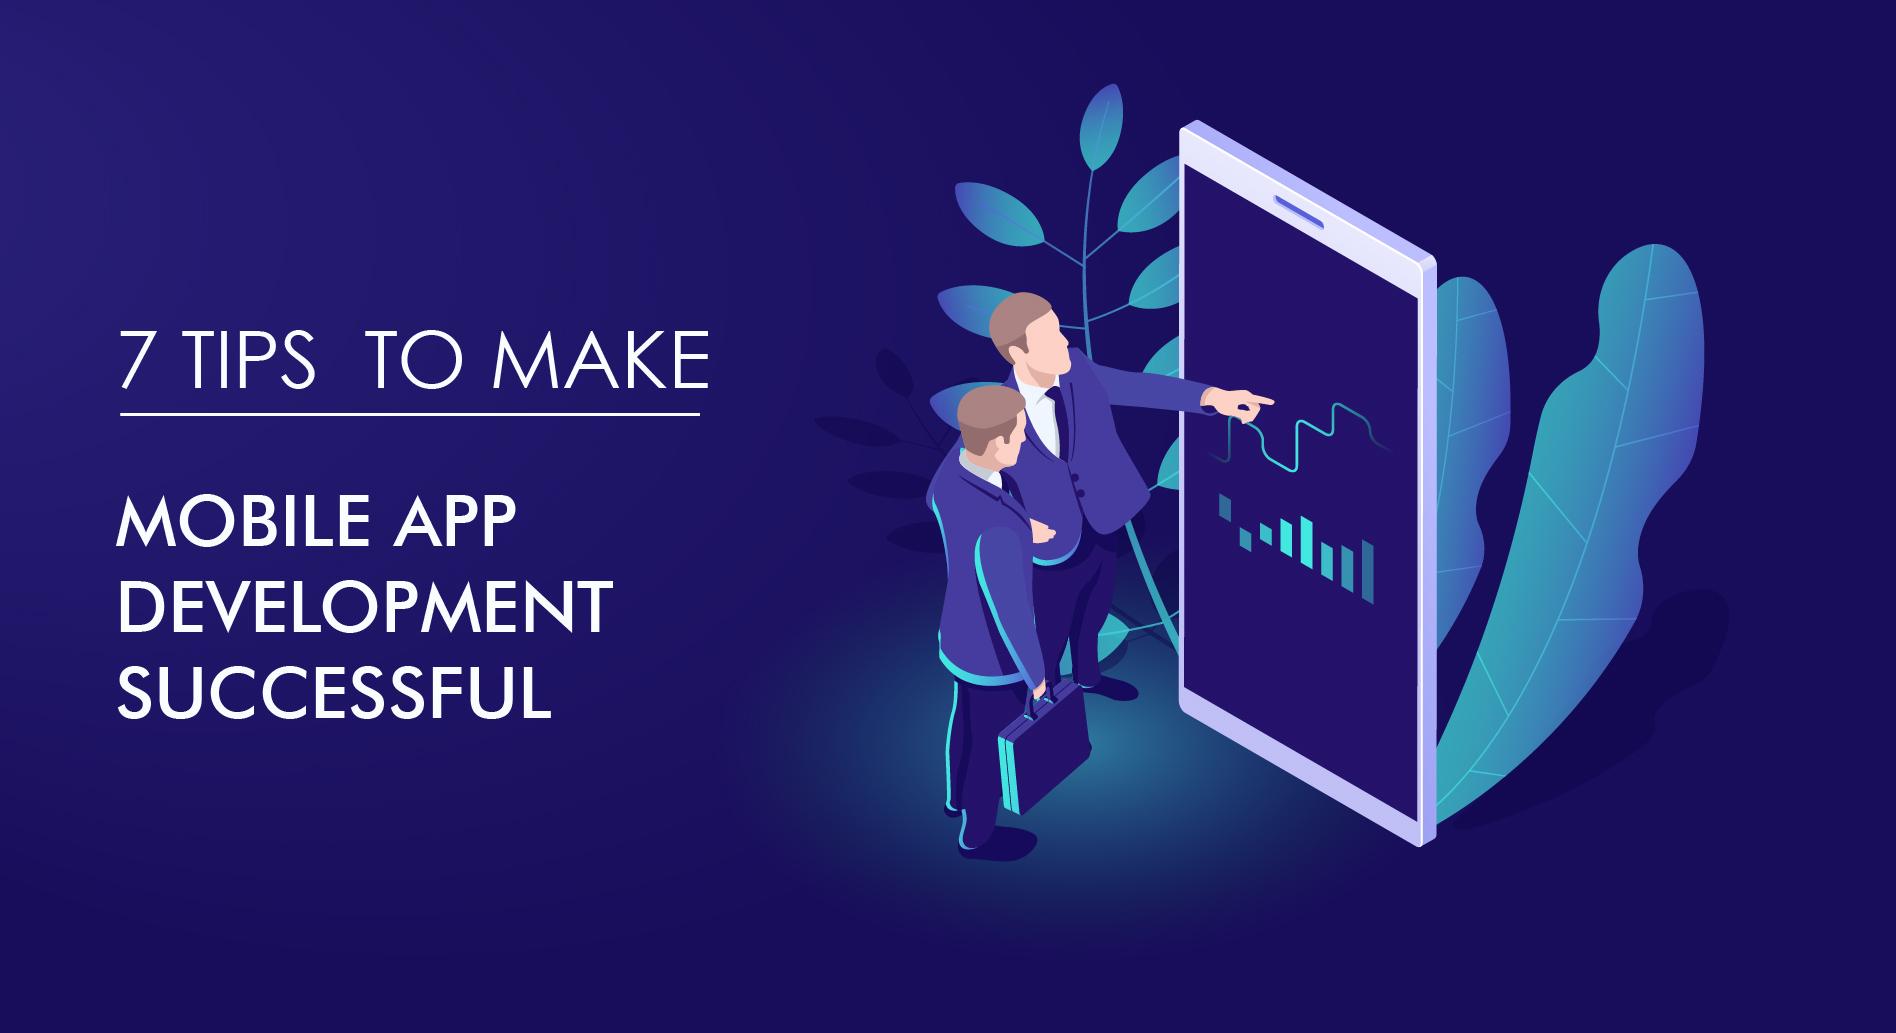 7 Tips To Make Mobile App Development Successful